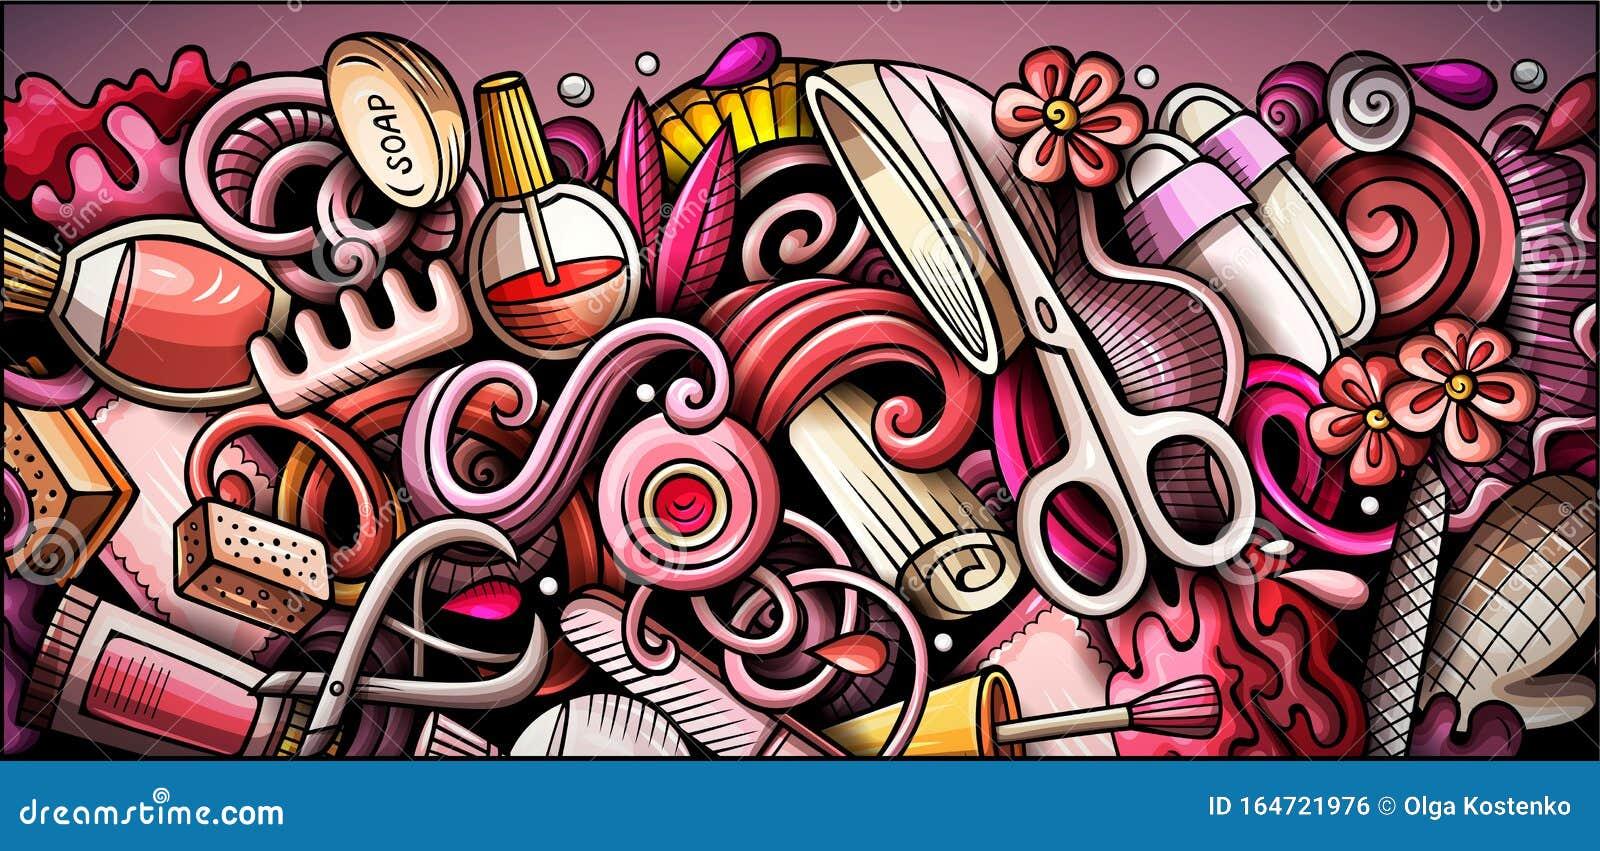 Nail Salon Hand Drawn Doodle Banner Cartoon Detailed Illustrations Stock Vector Illustration Of Banner Graffiti 164721976